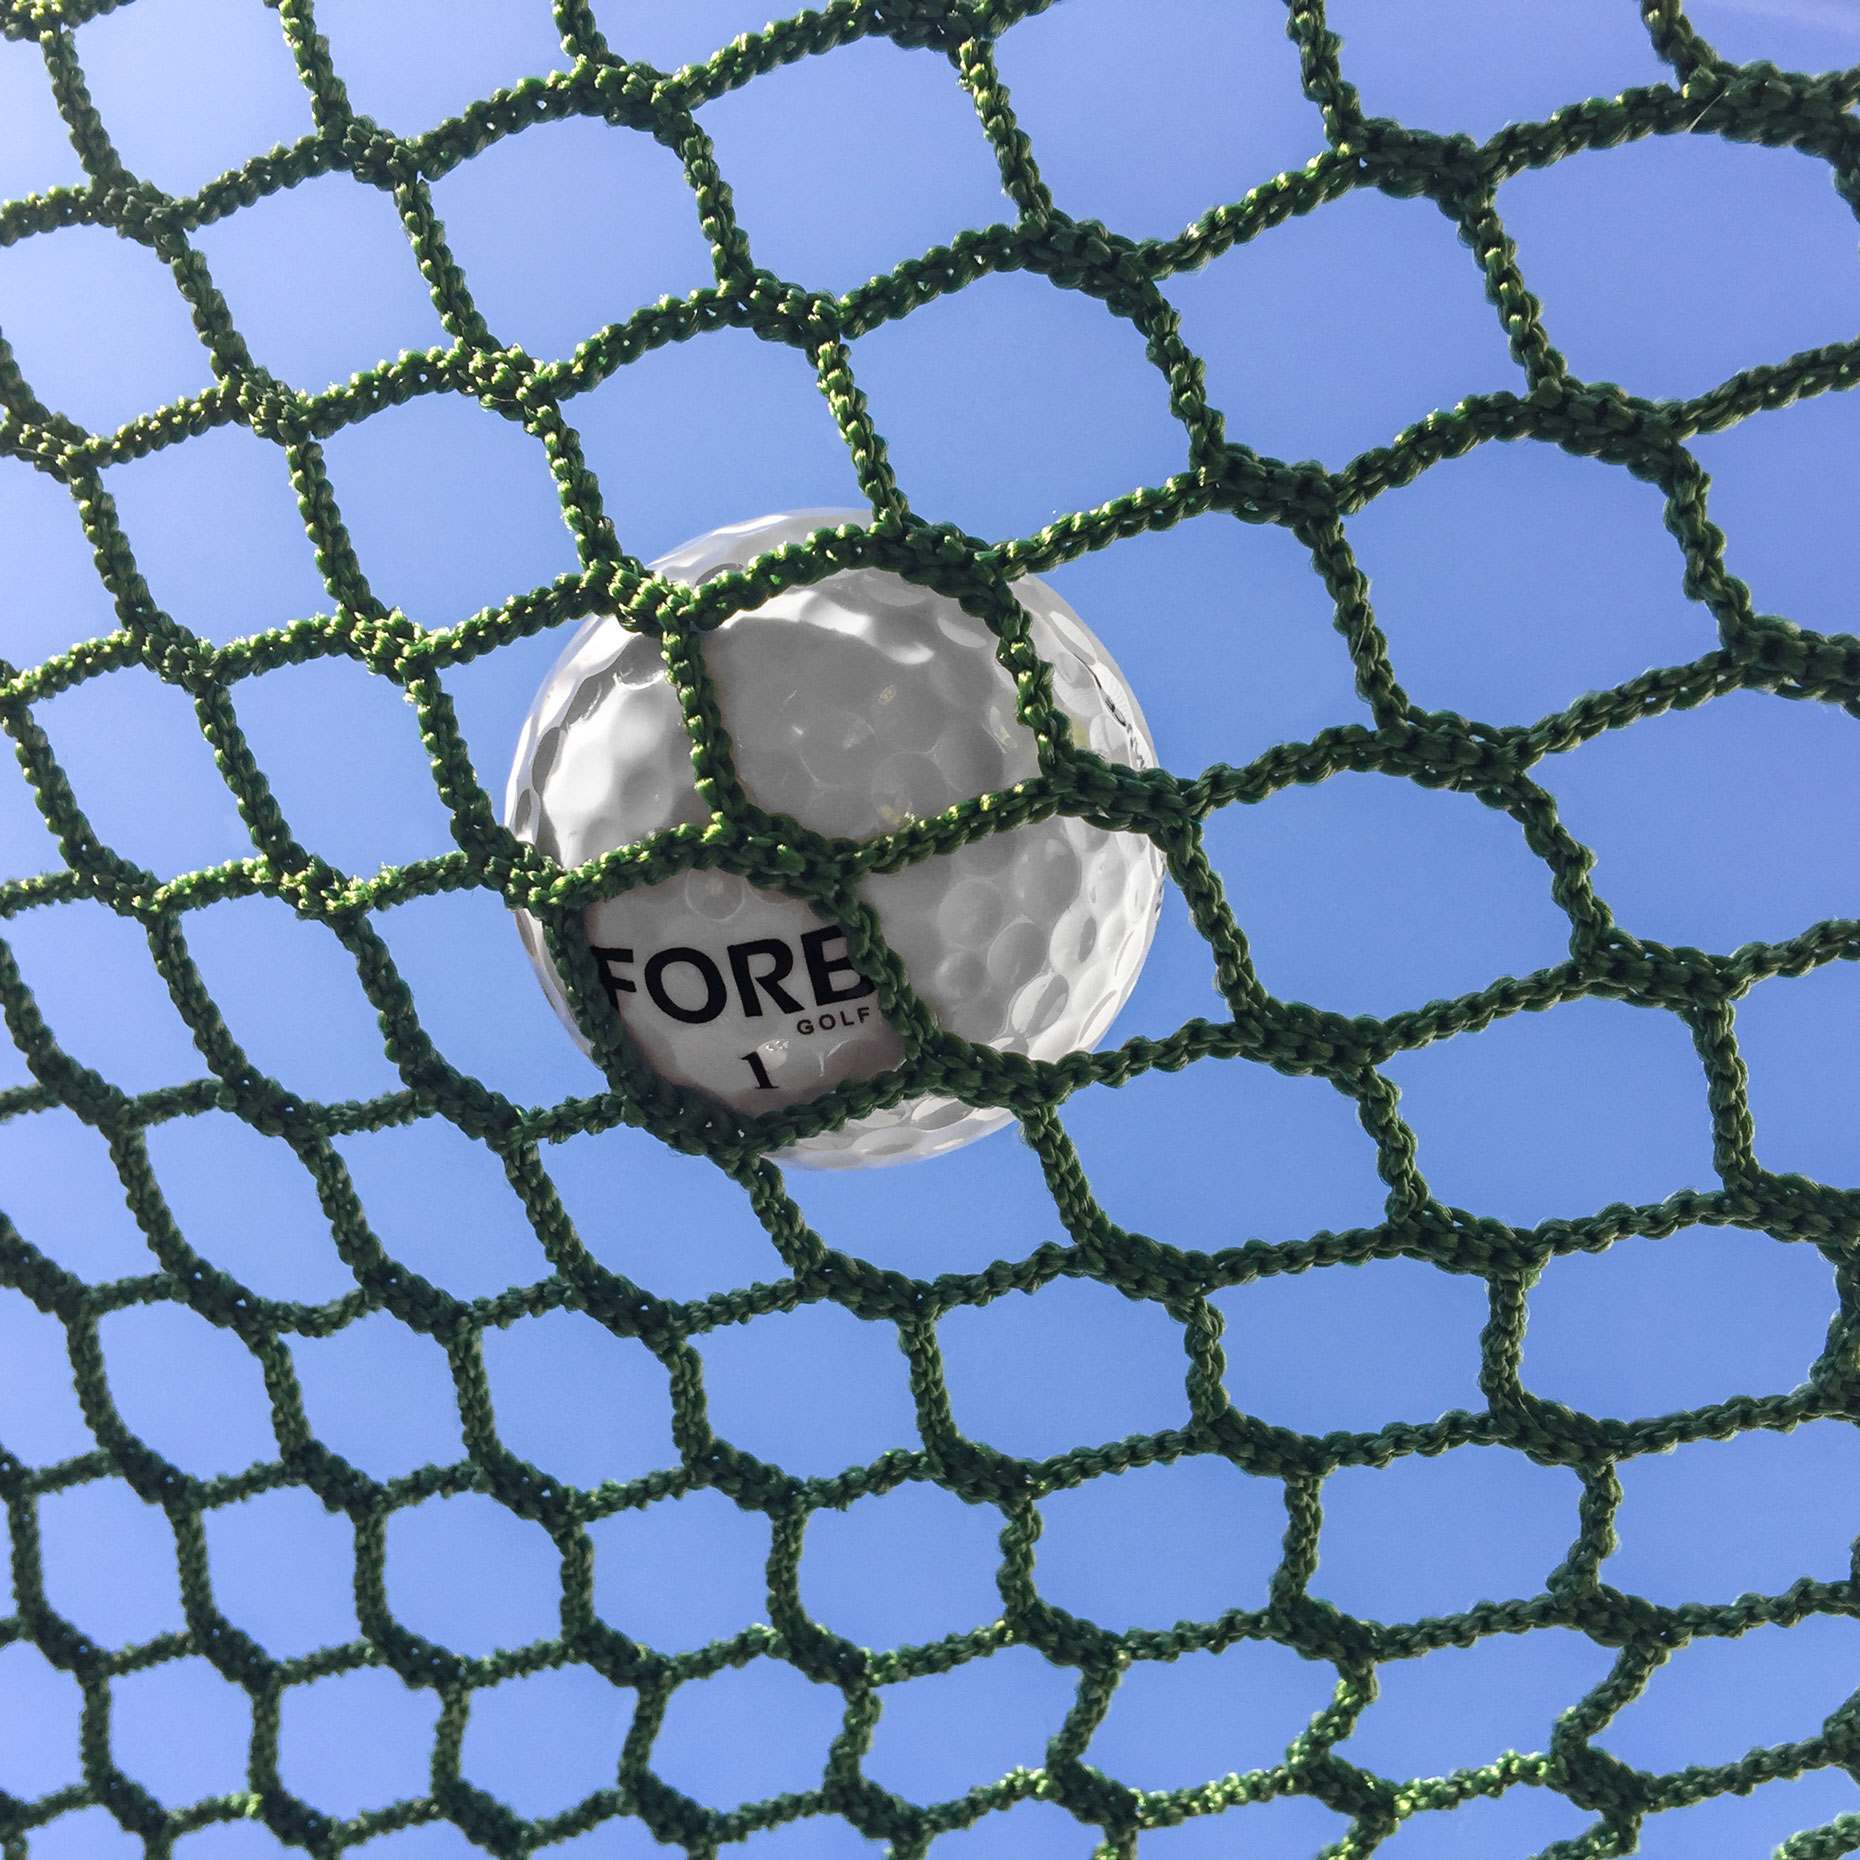 golf nets golf cages golf practice nets net world sports